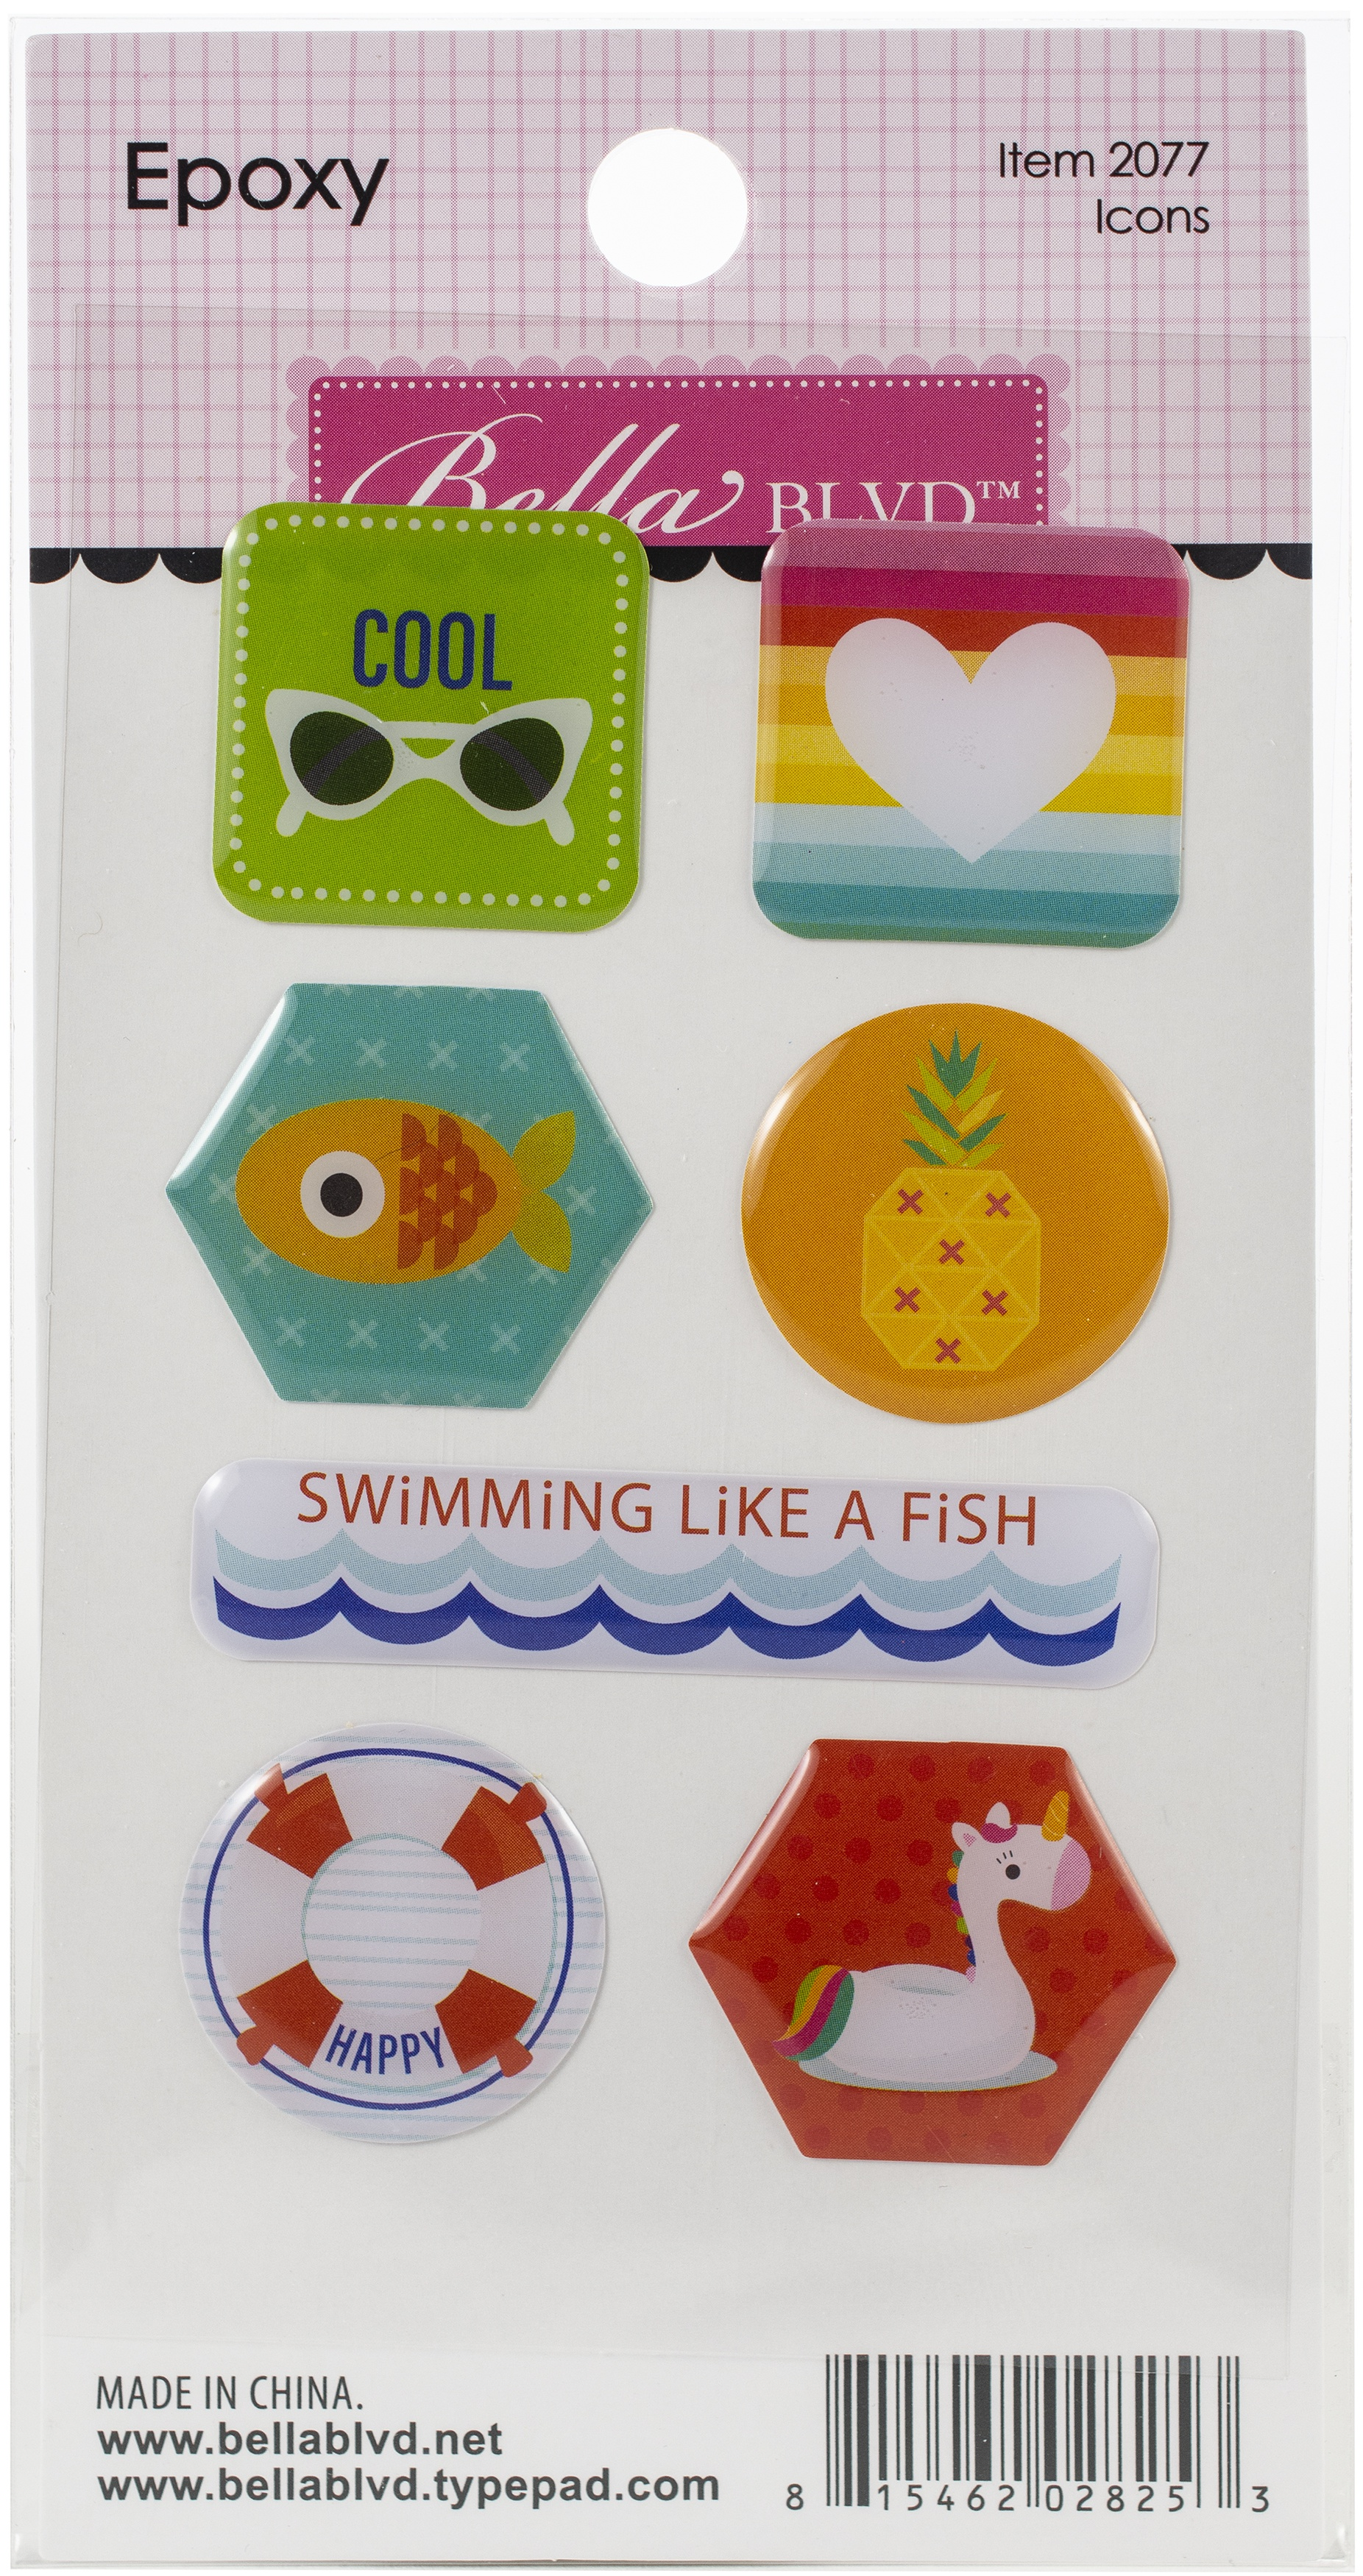 ^Bella Blvd - Splash Zone Epoxy Stickers